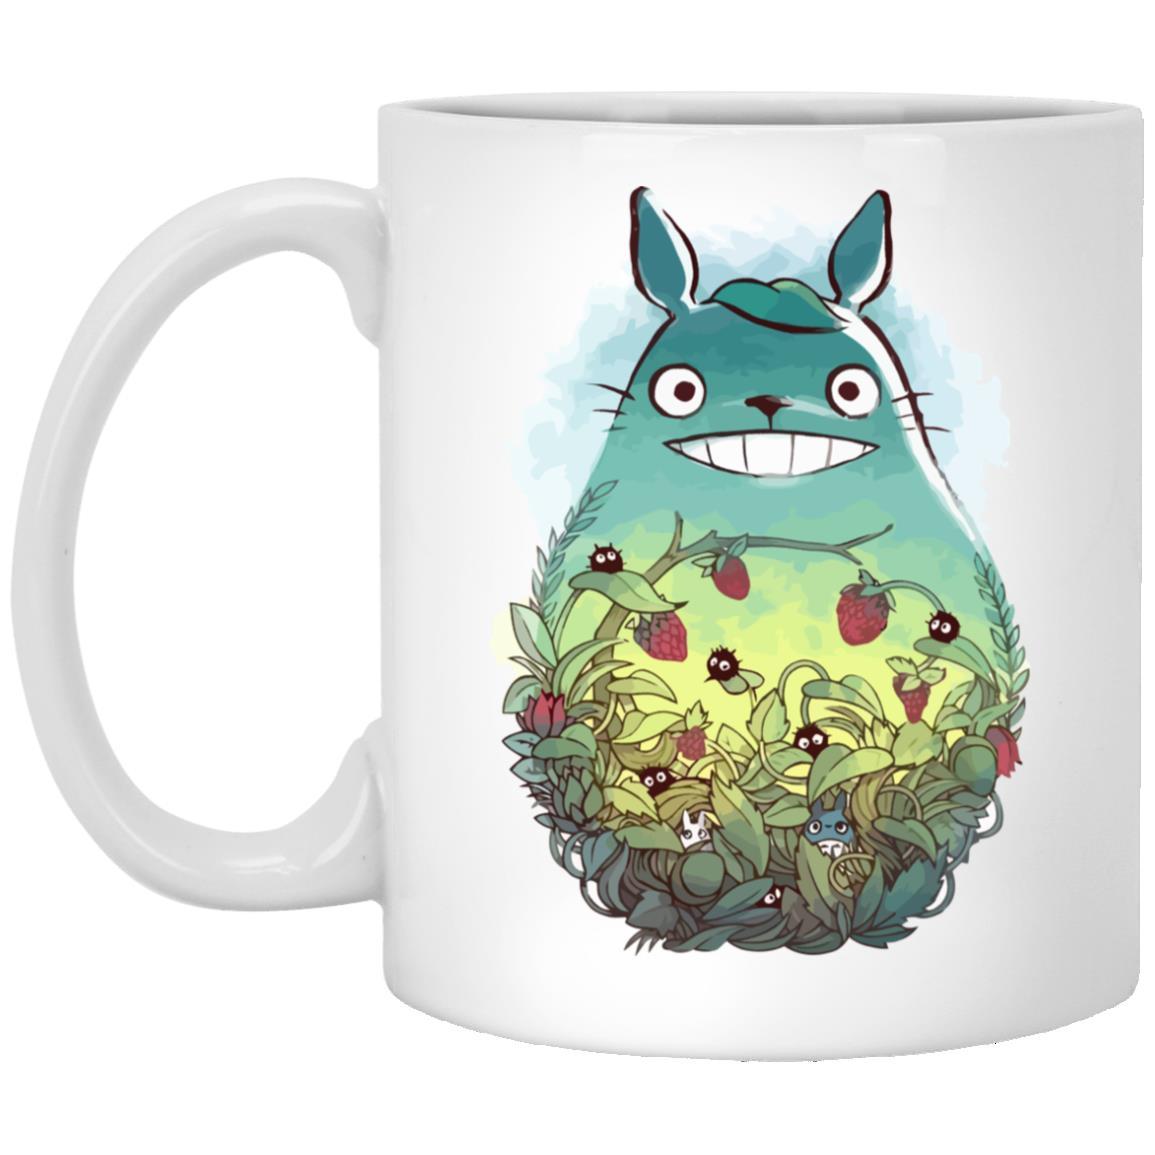 My Neighbor Totoro – Green Garden Mug